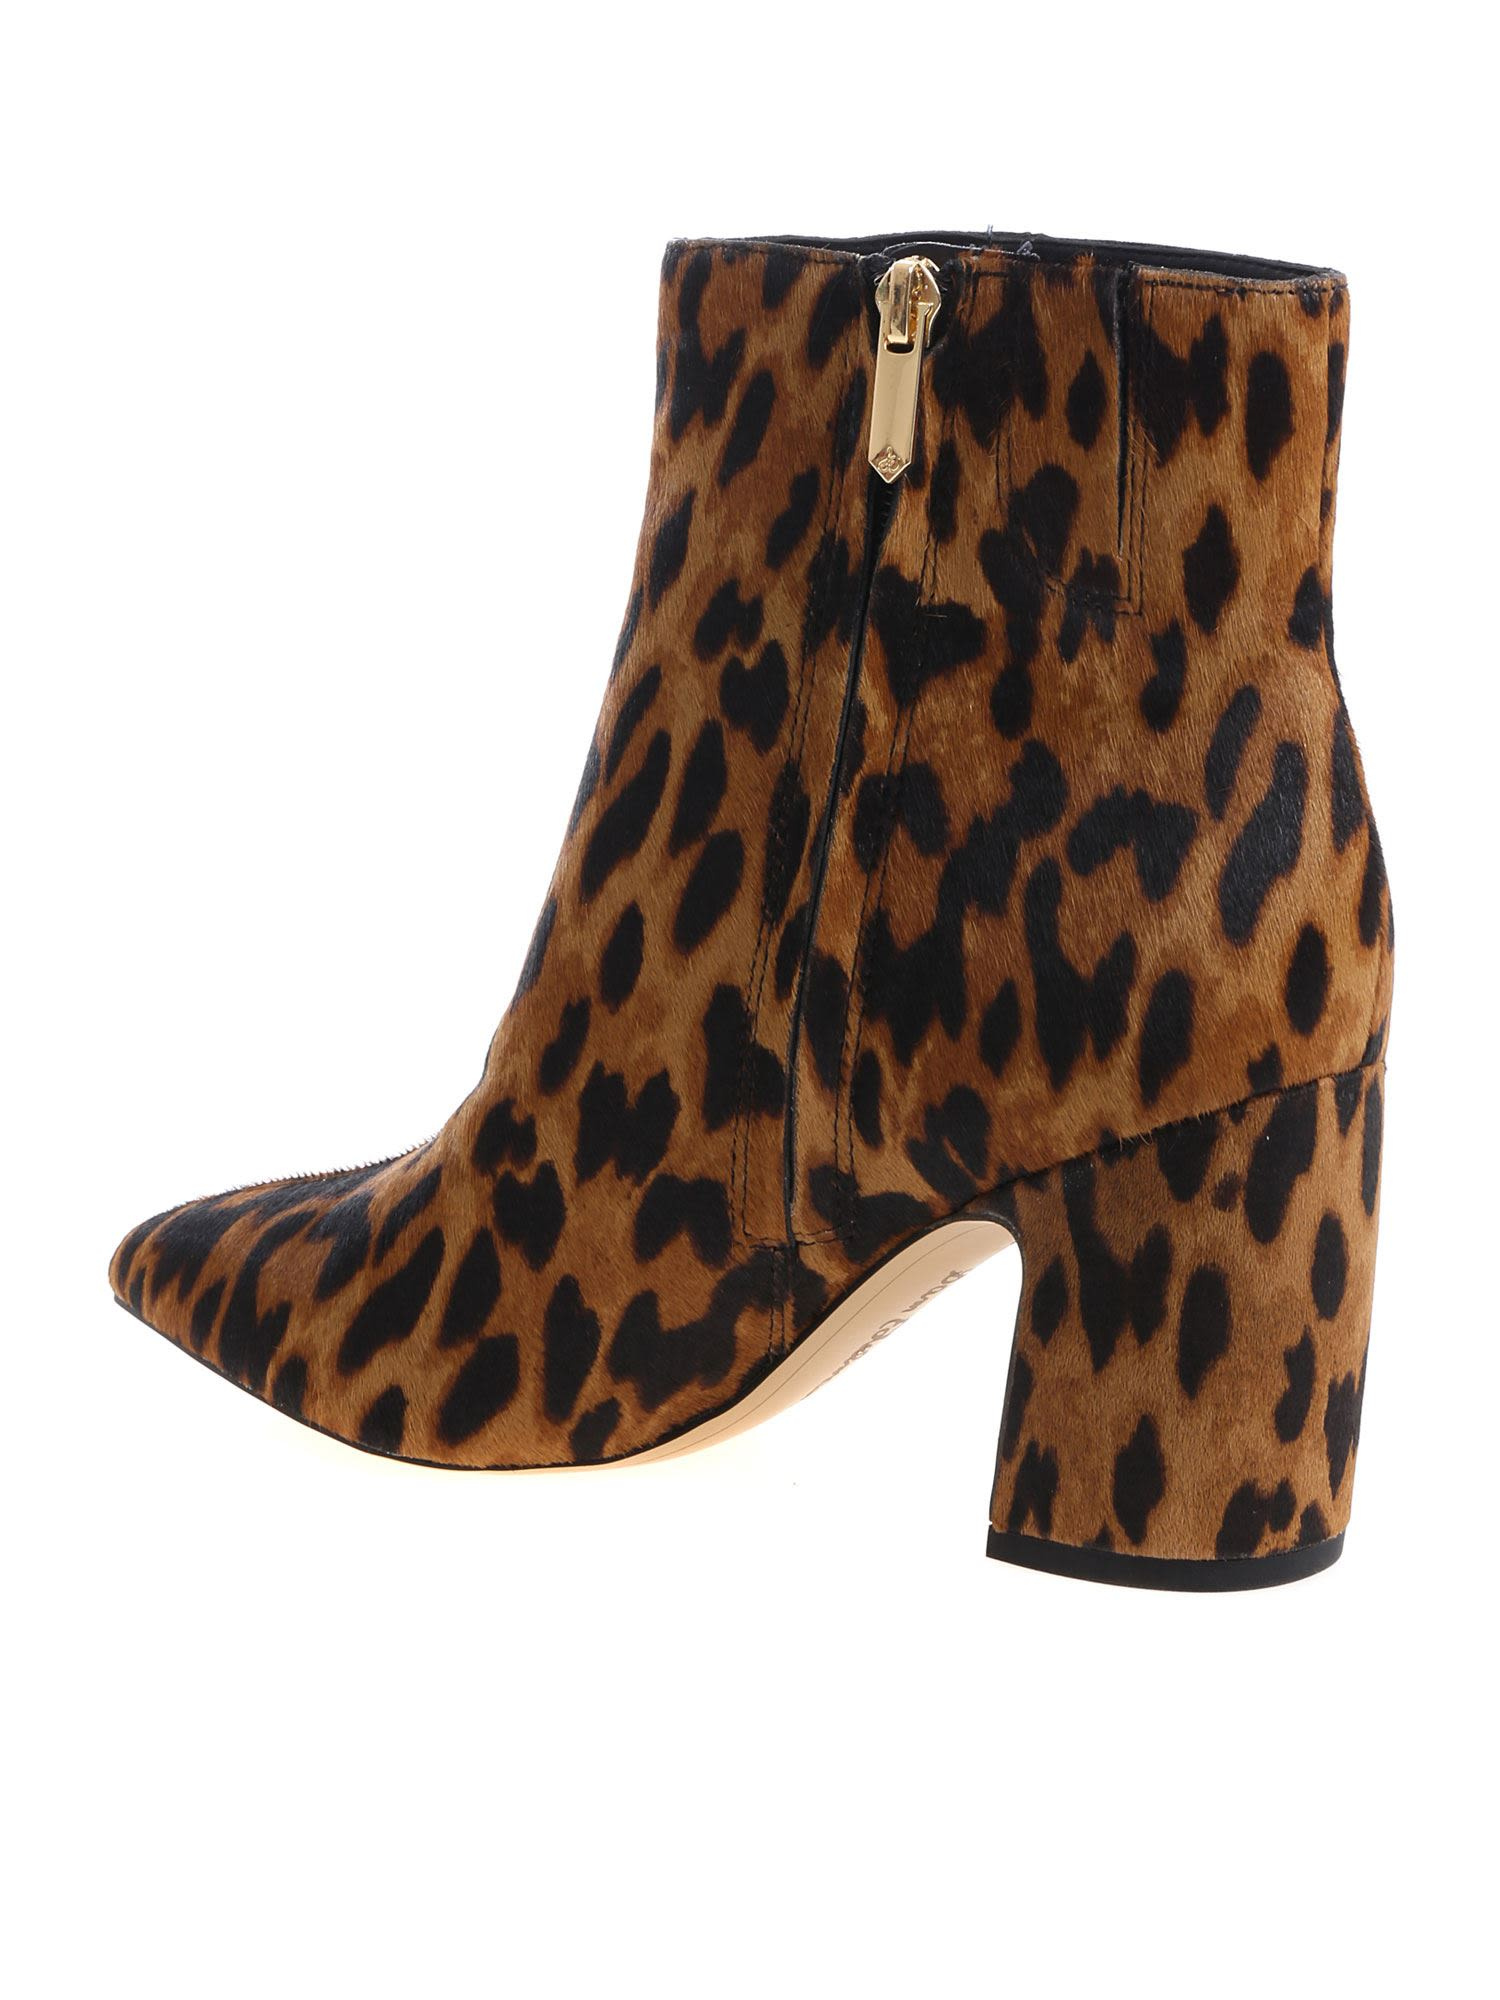 107c47a4c Sam Edelman Sam Edelman Hilty Leopard Boots - Maculato - 10763130 ...